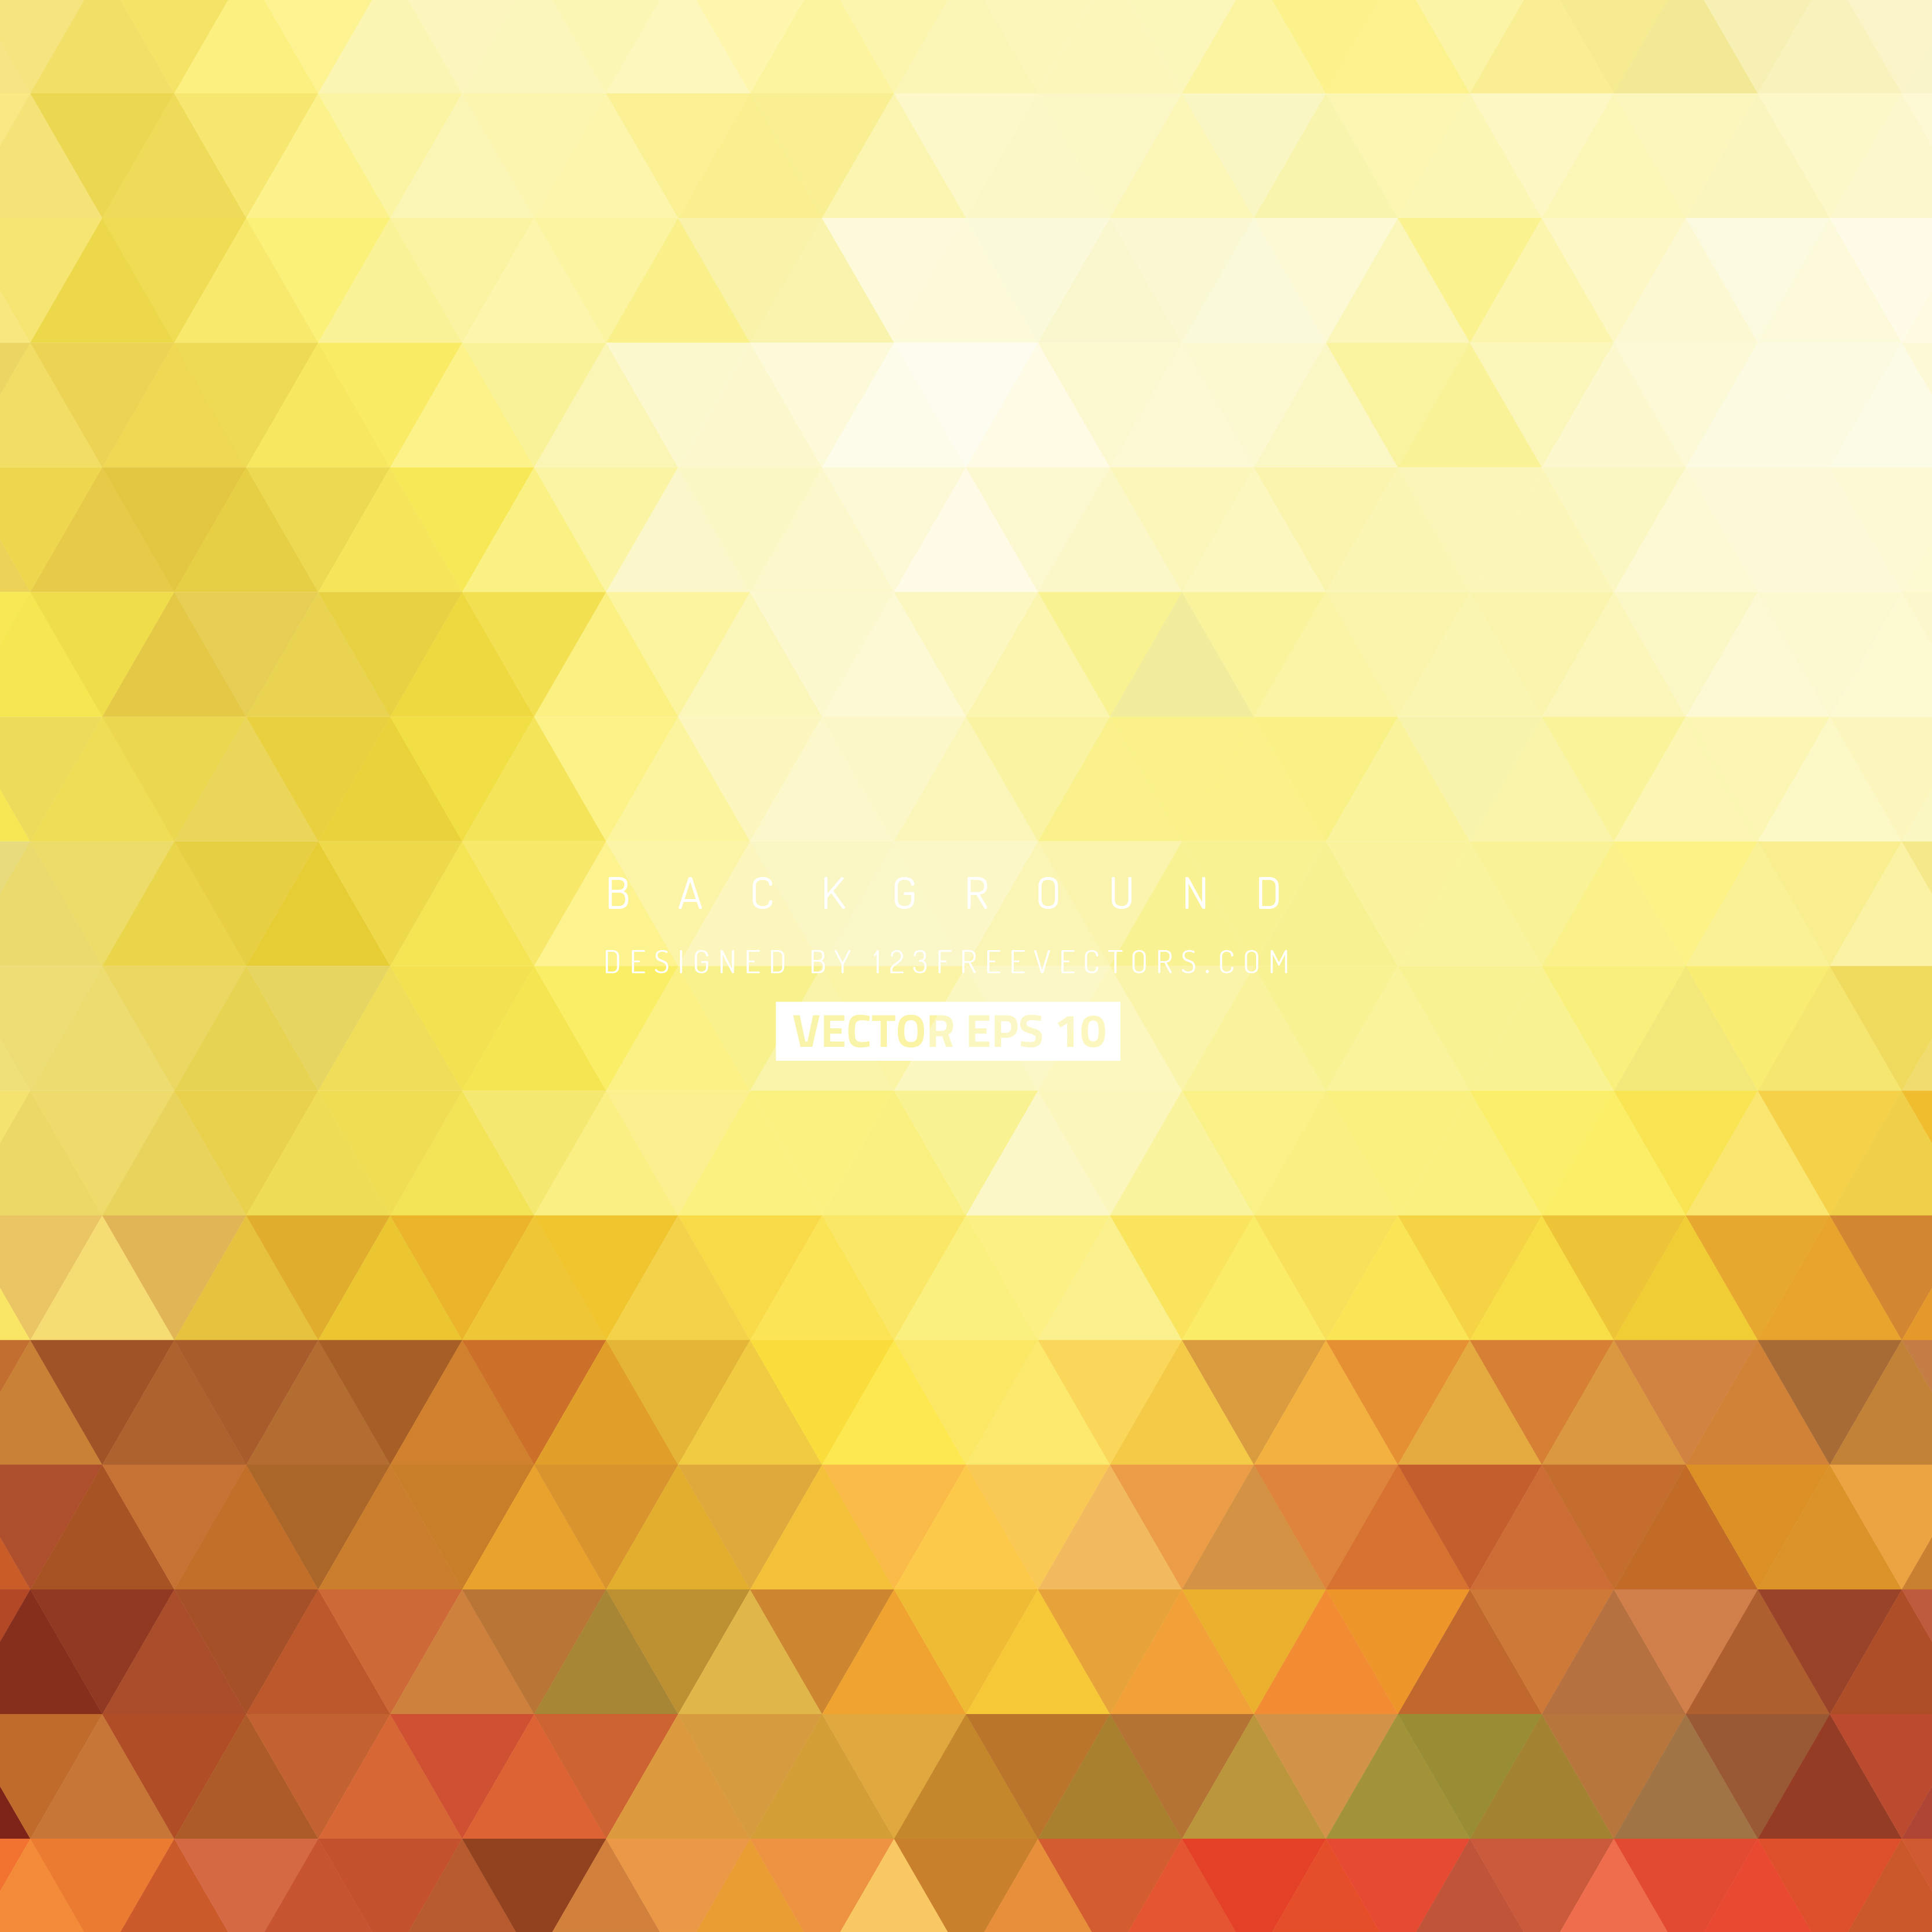 Yellow Background Design Vector